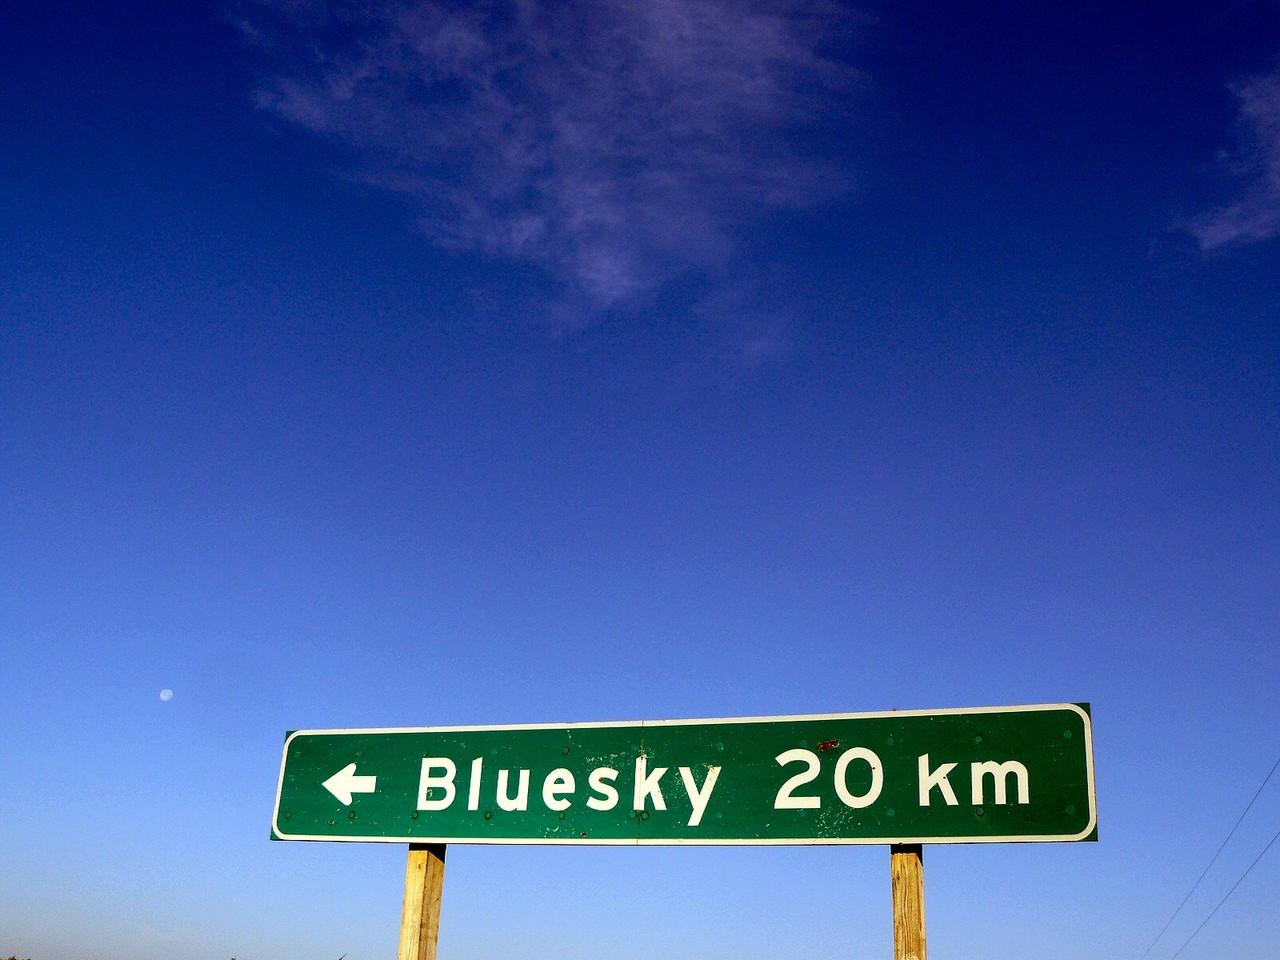 <B>Ach, noch 20 km?